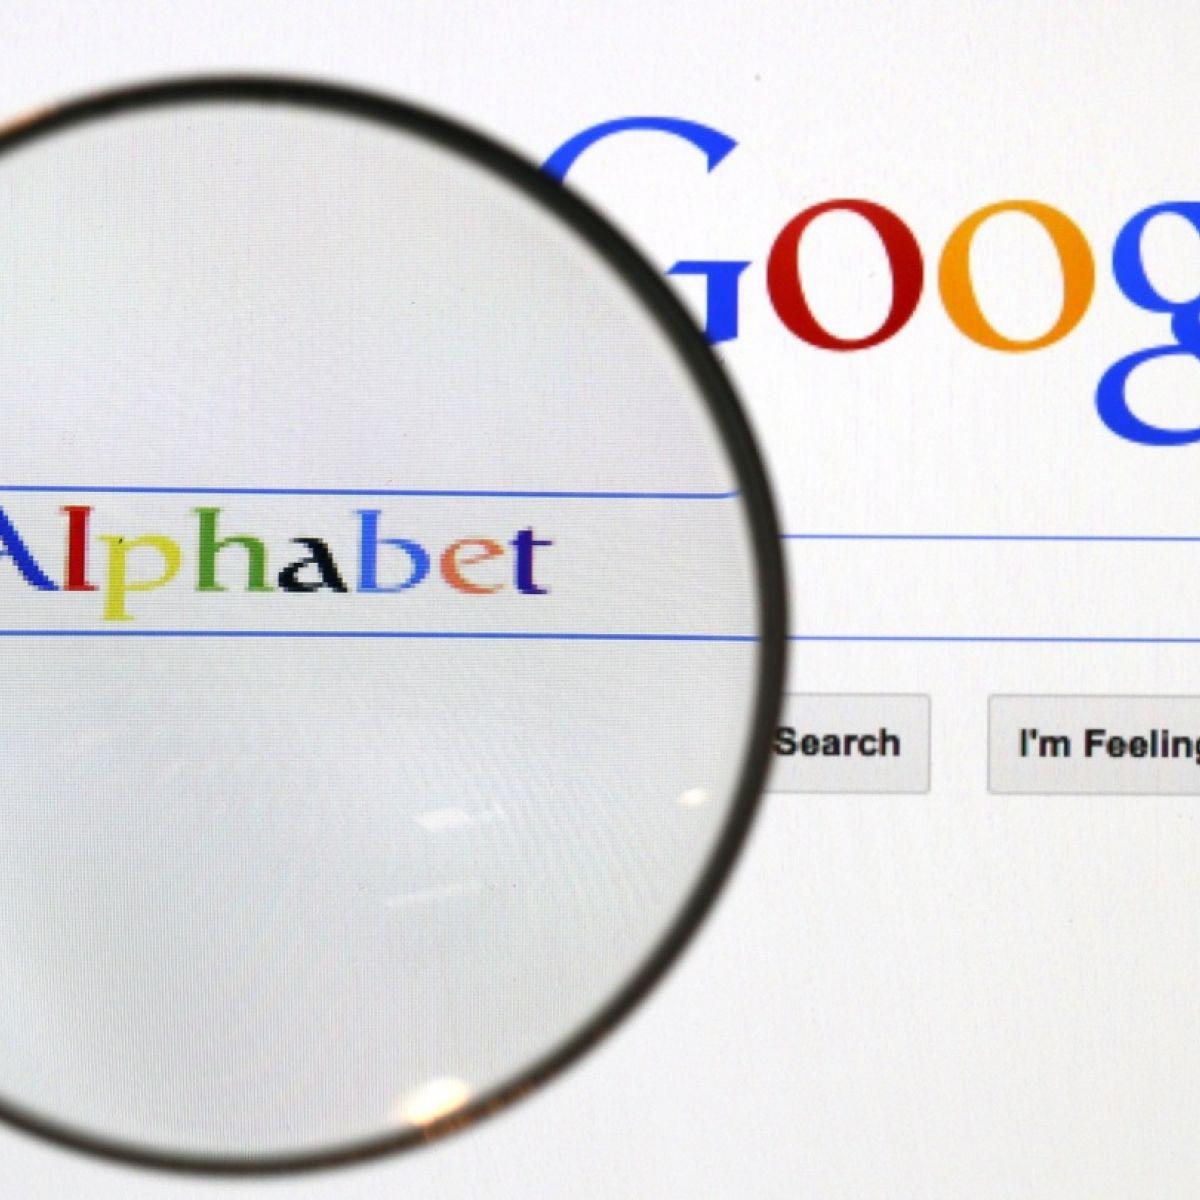 Google buys abcdefghijklmnopqrstuvwxyz com